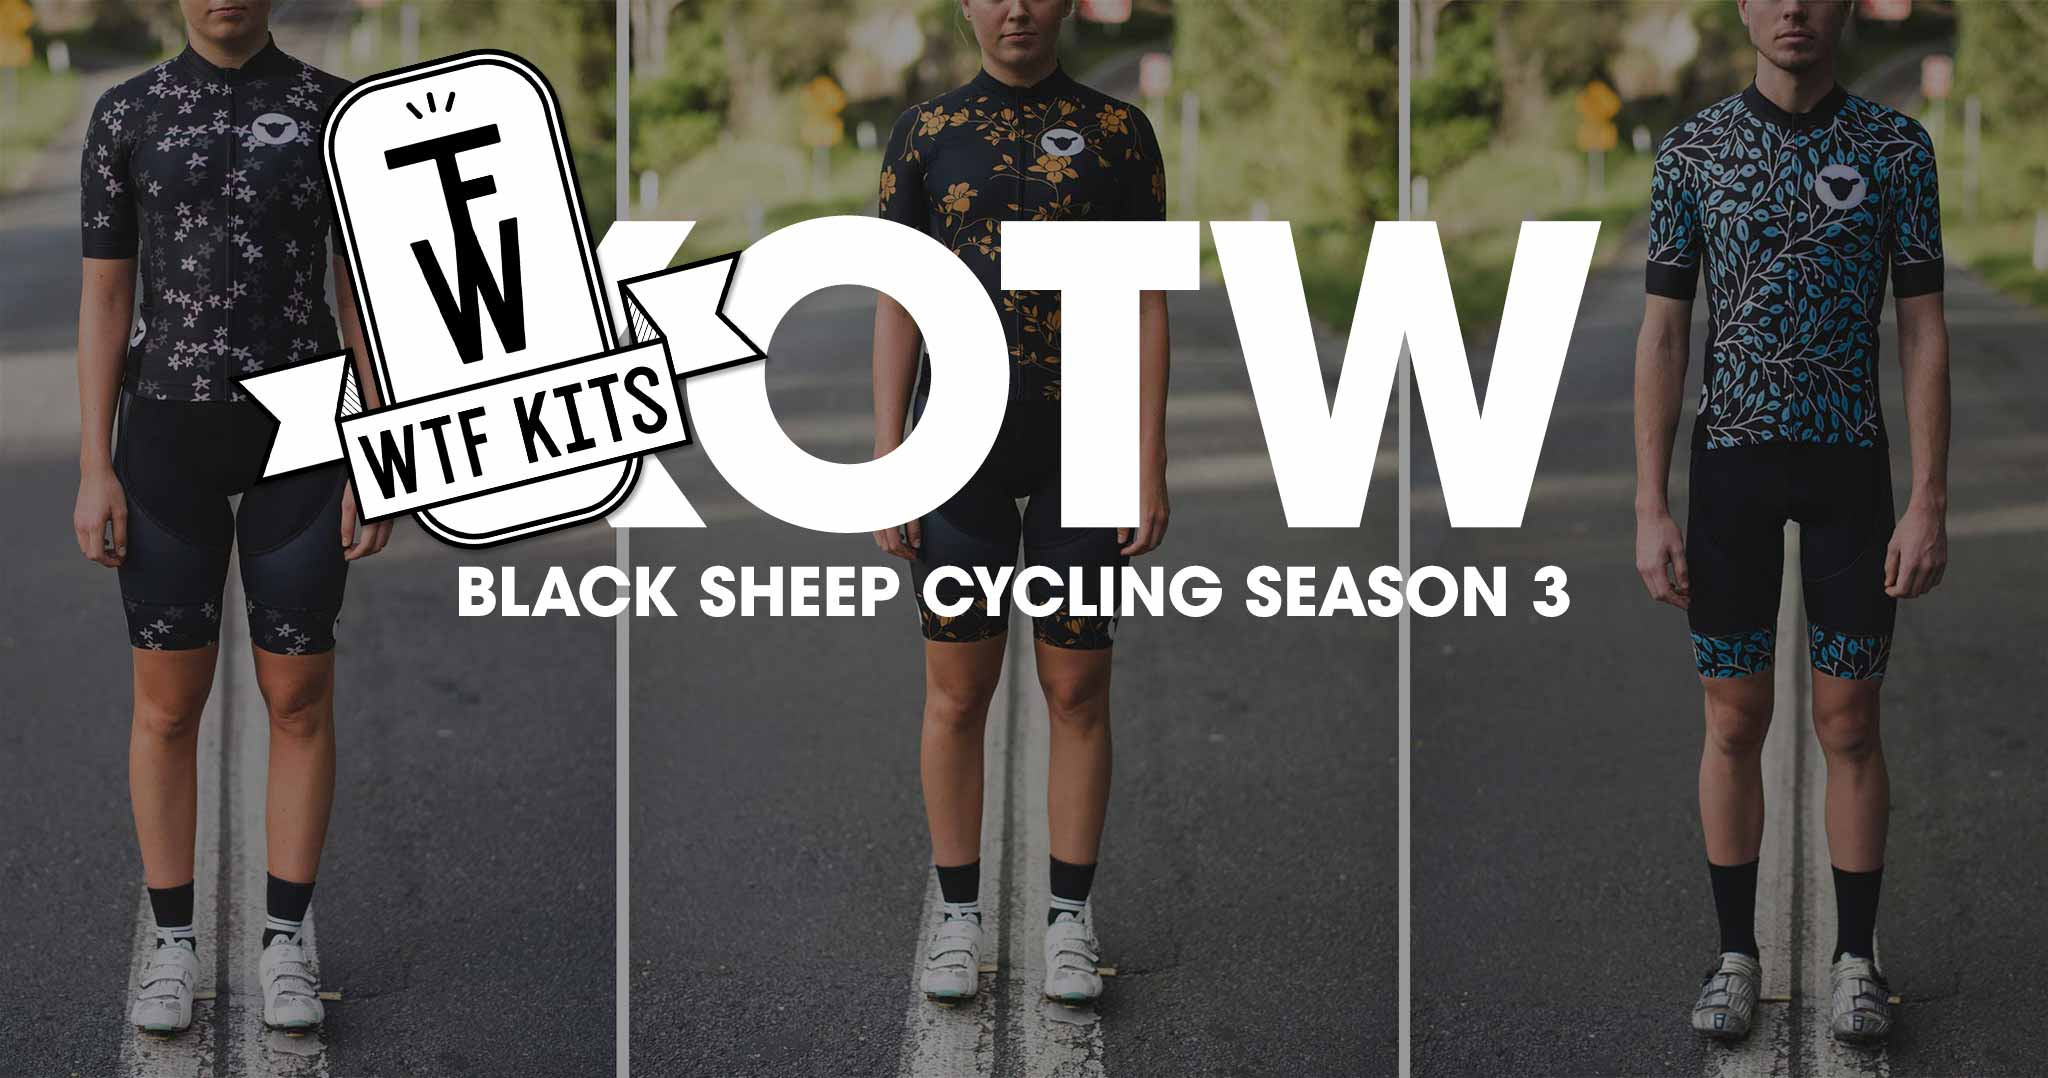 WTFKit Of The Week: Black Sheep Cycling Season 3